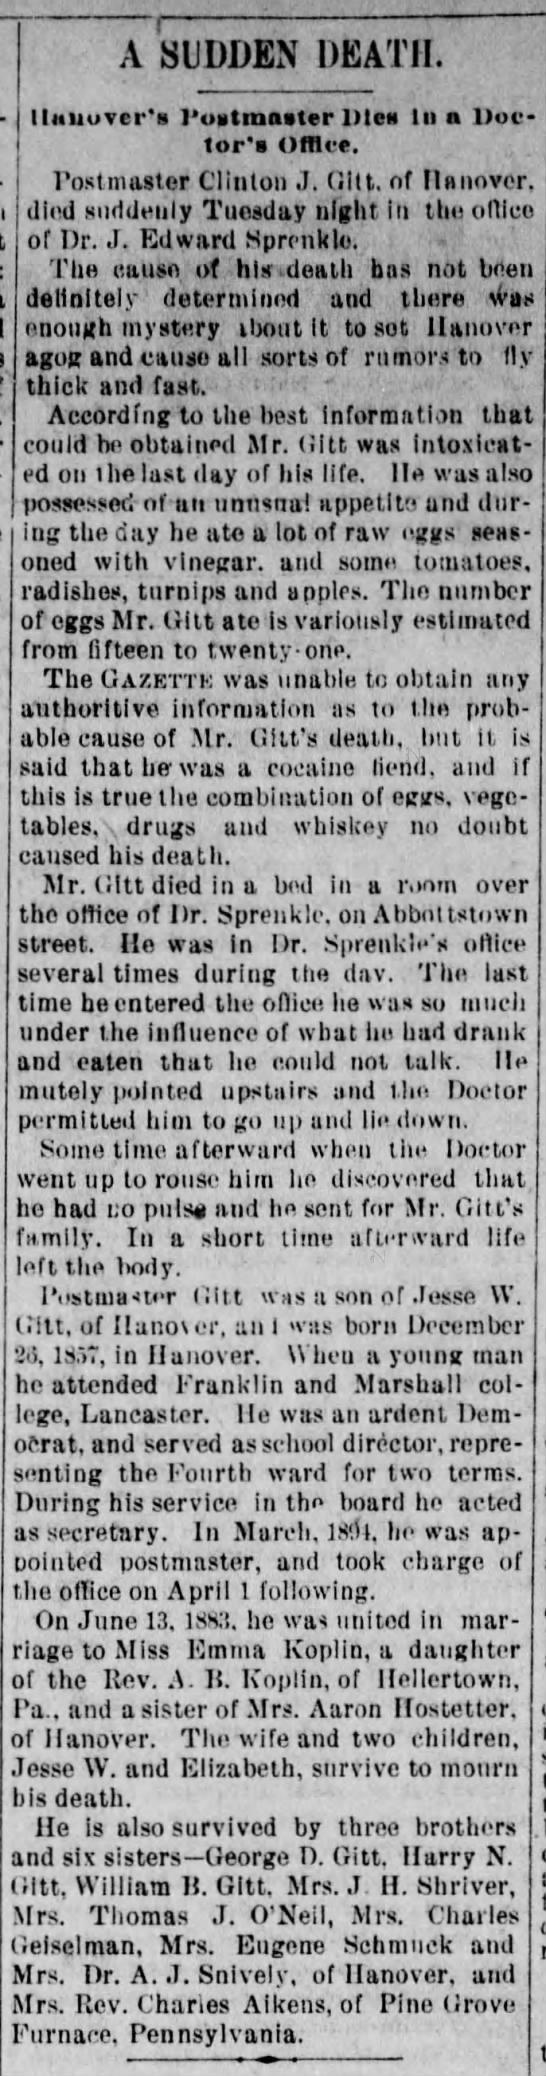 Gitt, Clinton; obit; The Semi-Weekly Gazette, Feb. 15, 1896 pg 2 -